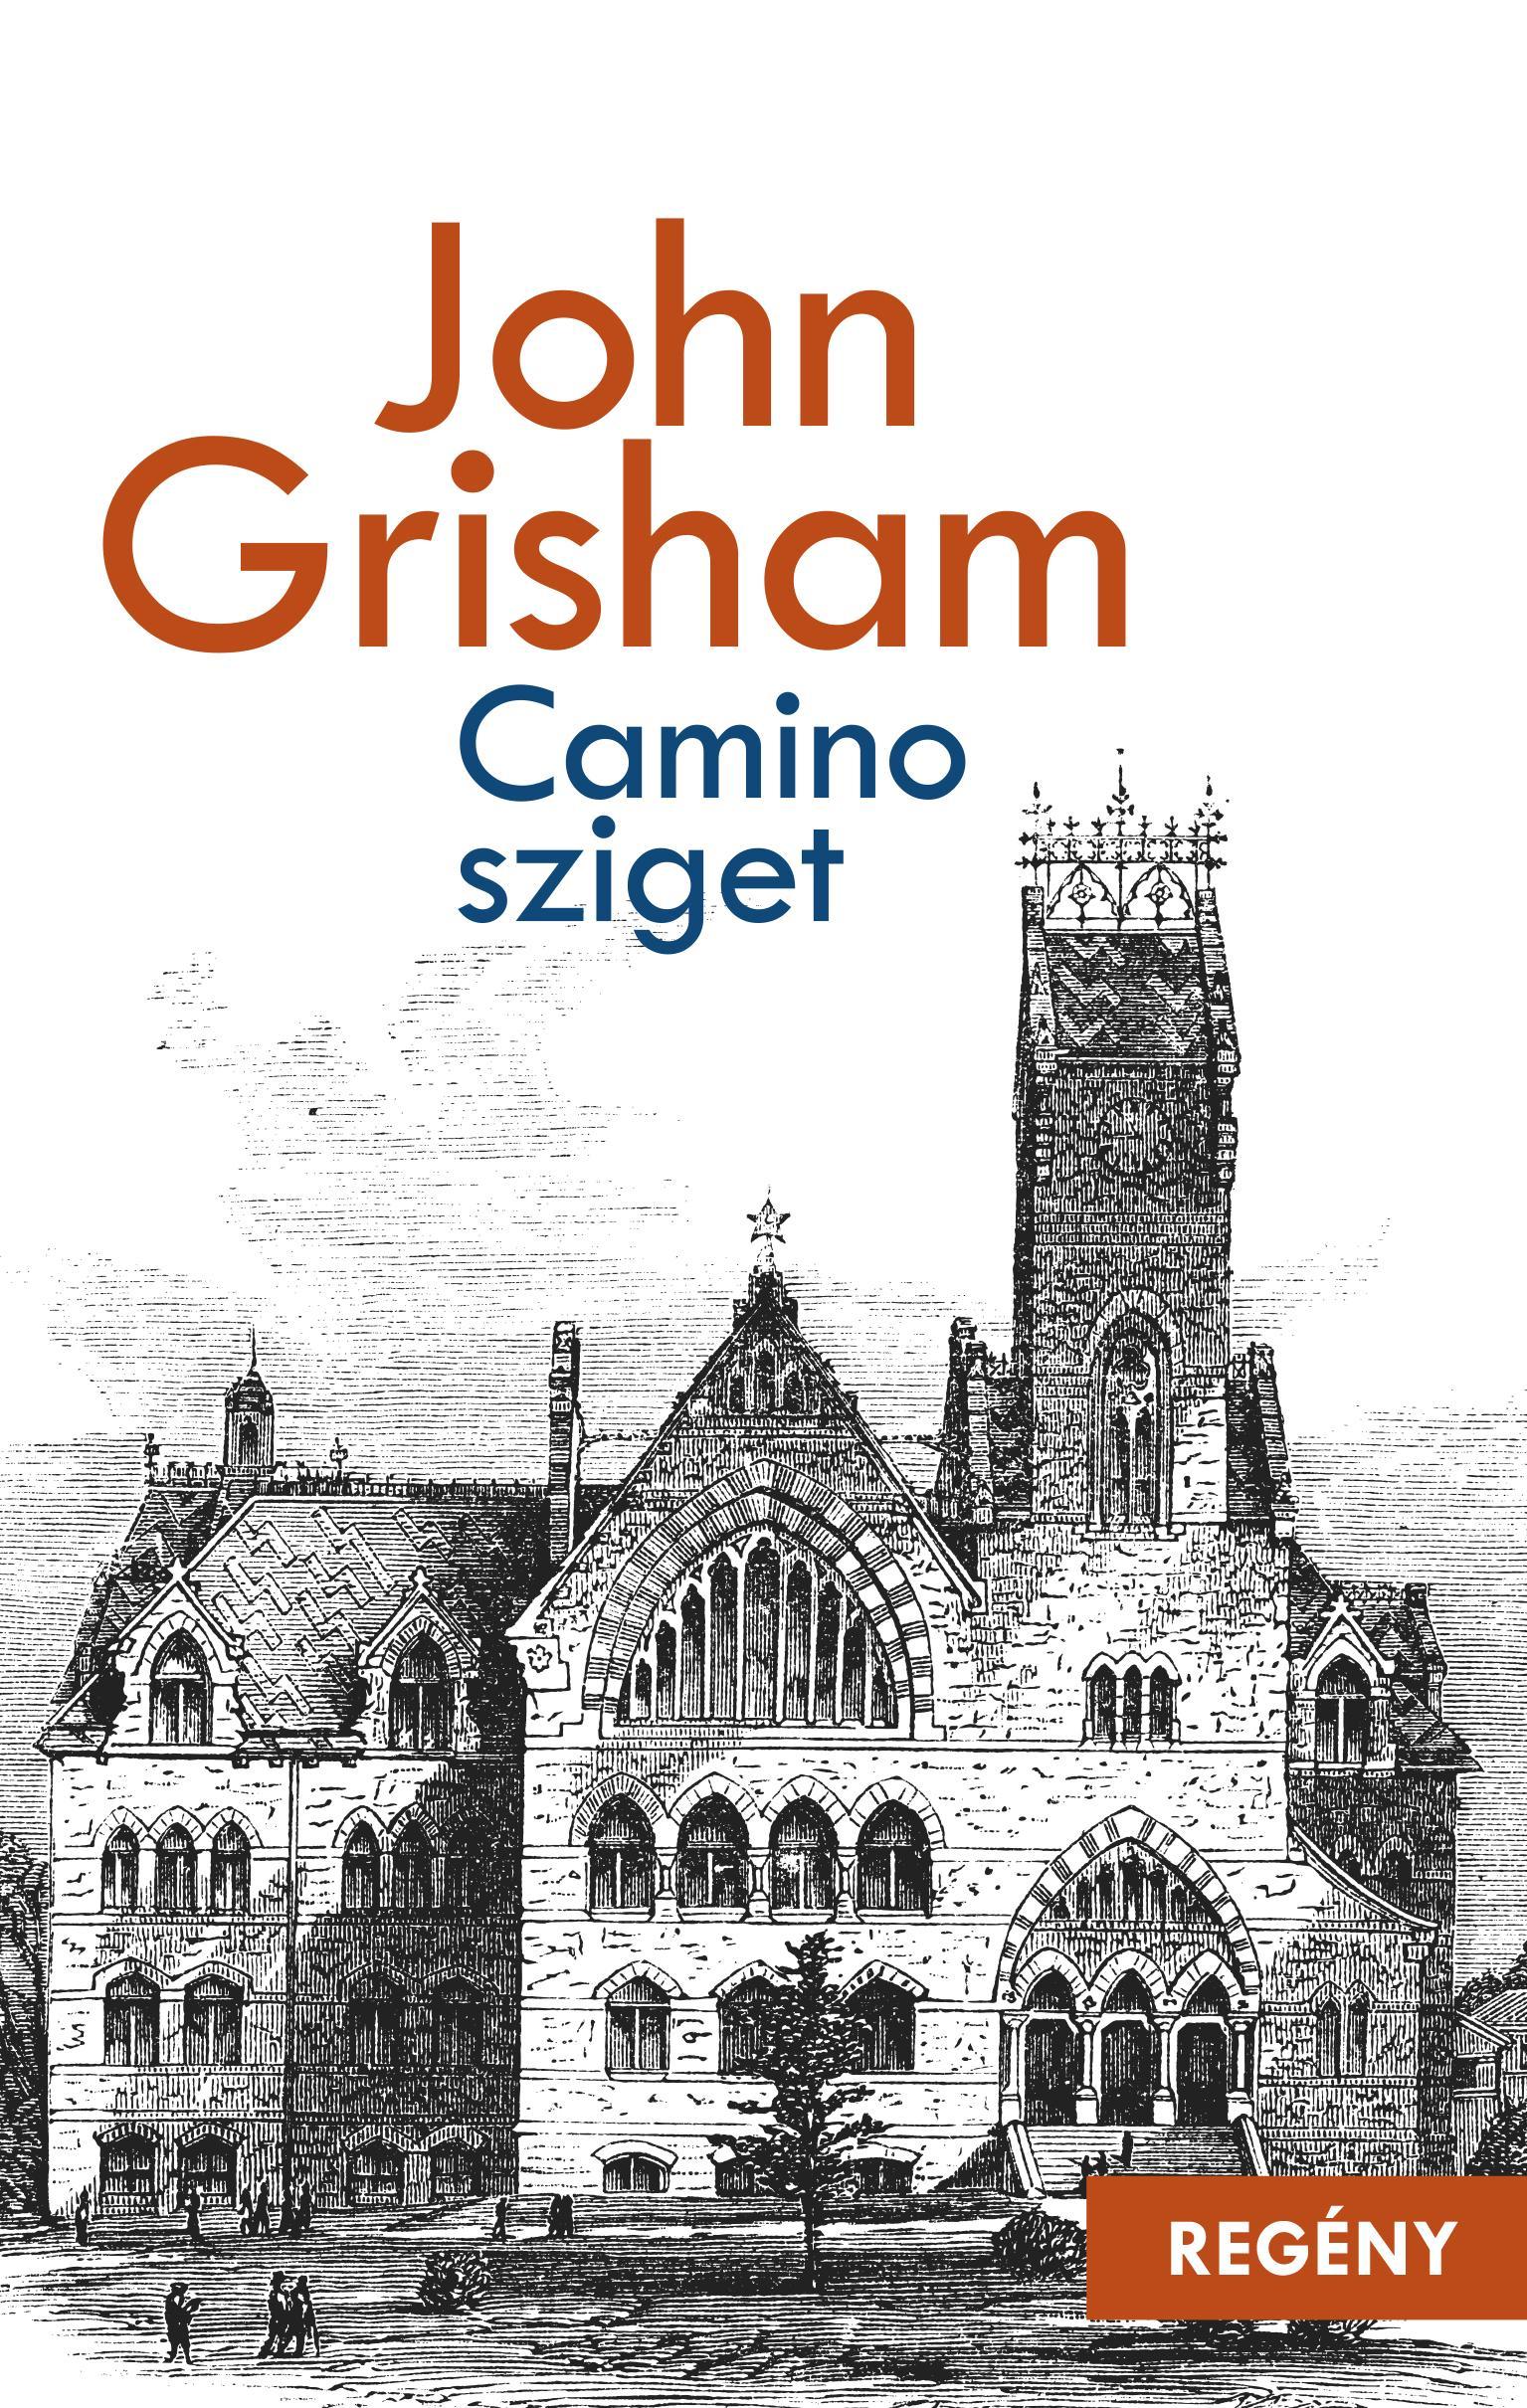 9786155724299 - John Grisham: Camino - sziget - Könyv